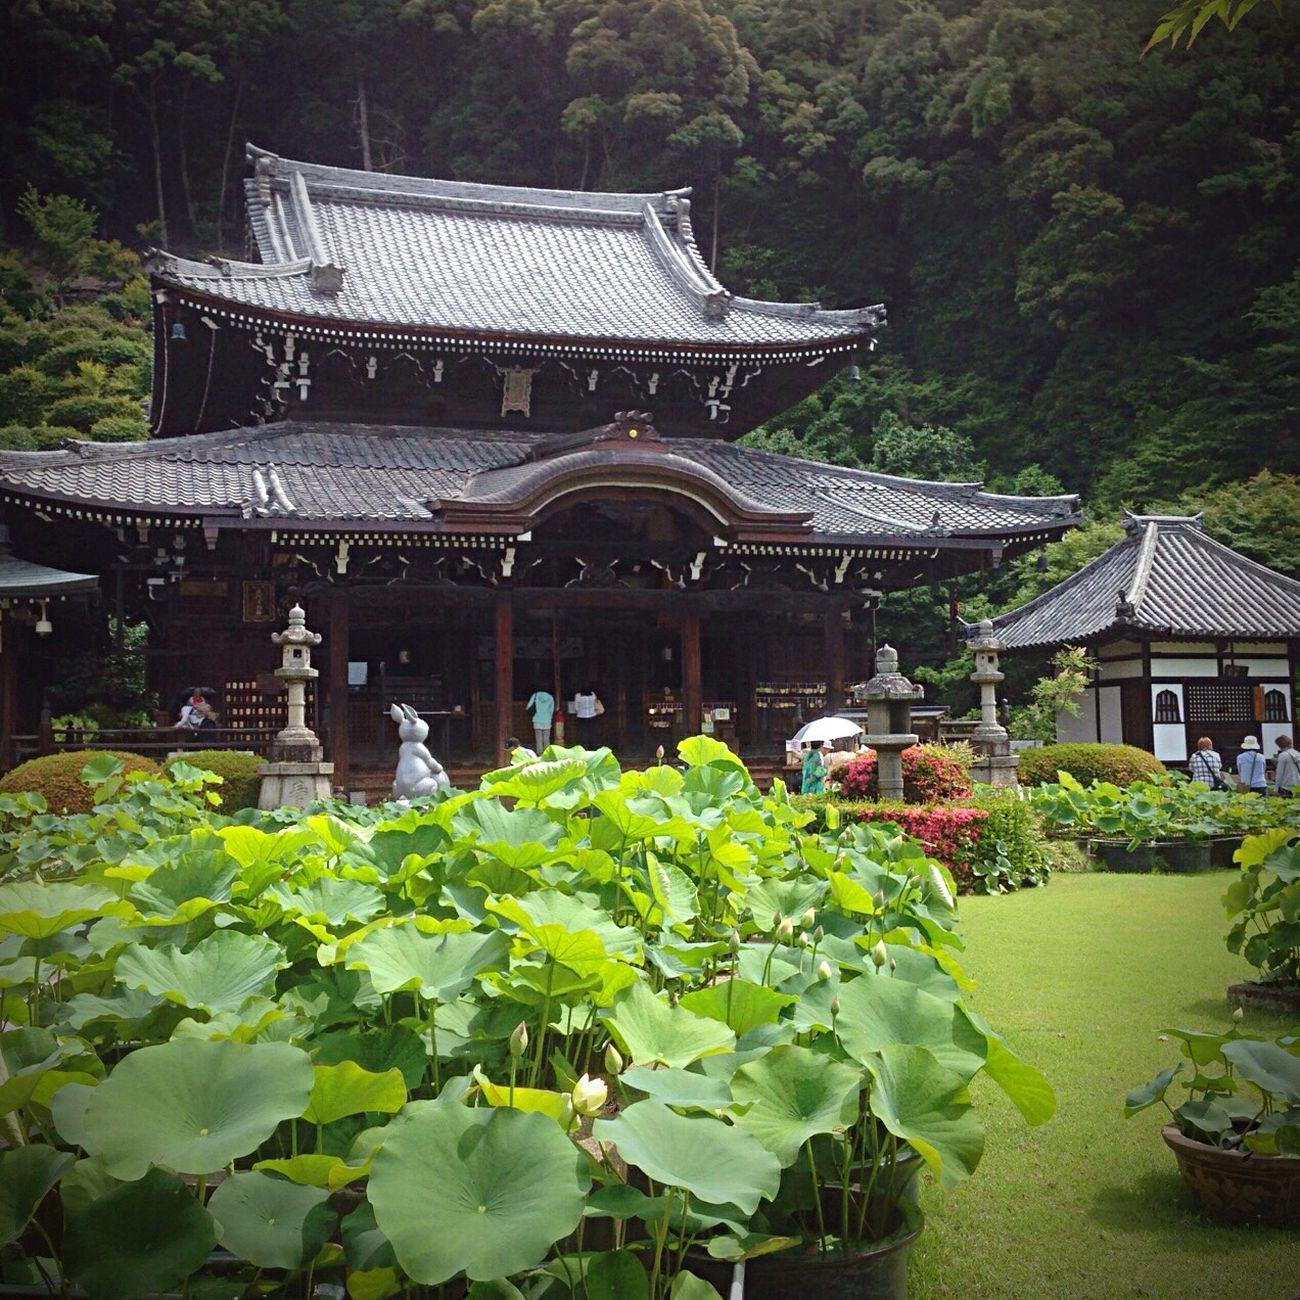 Kyoto Japan Mimurotoji Uji Temple 京都 日本 三室戸寺 宇治 寺